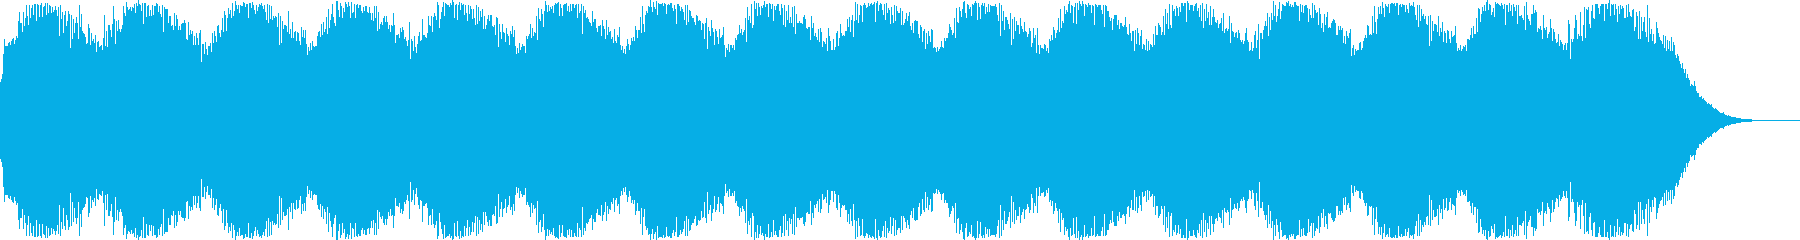 SFアニメに出て来そうな警報音のイメー…の再生済みの波形